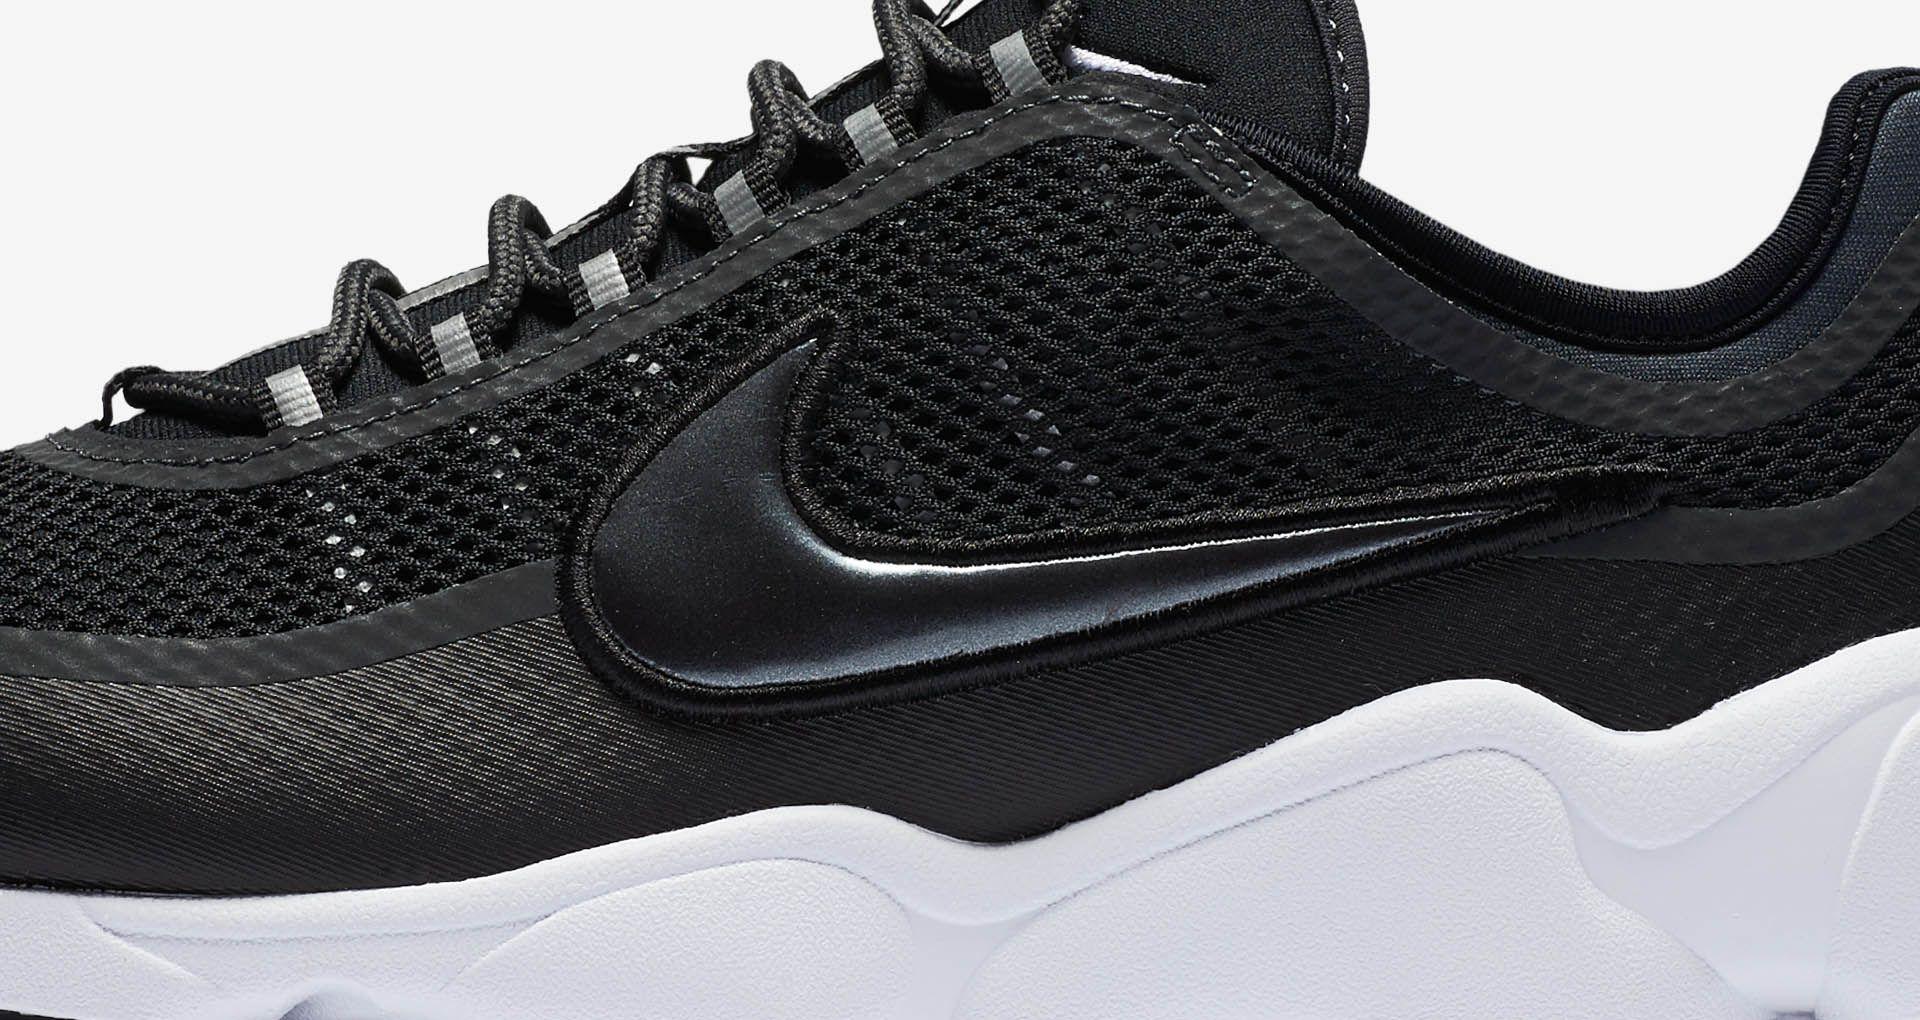 80d865ef3d0f Nike Air Zoom Spiridon Ultra  Black   Anthracite . Nike+ SNKRS